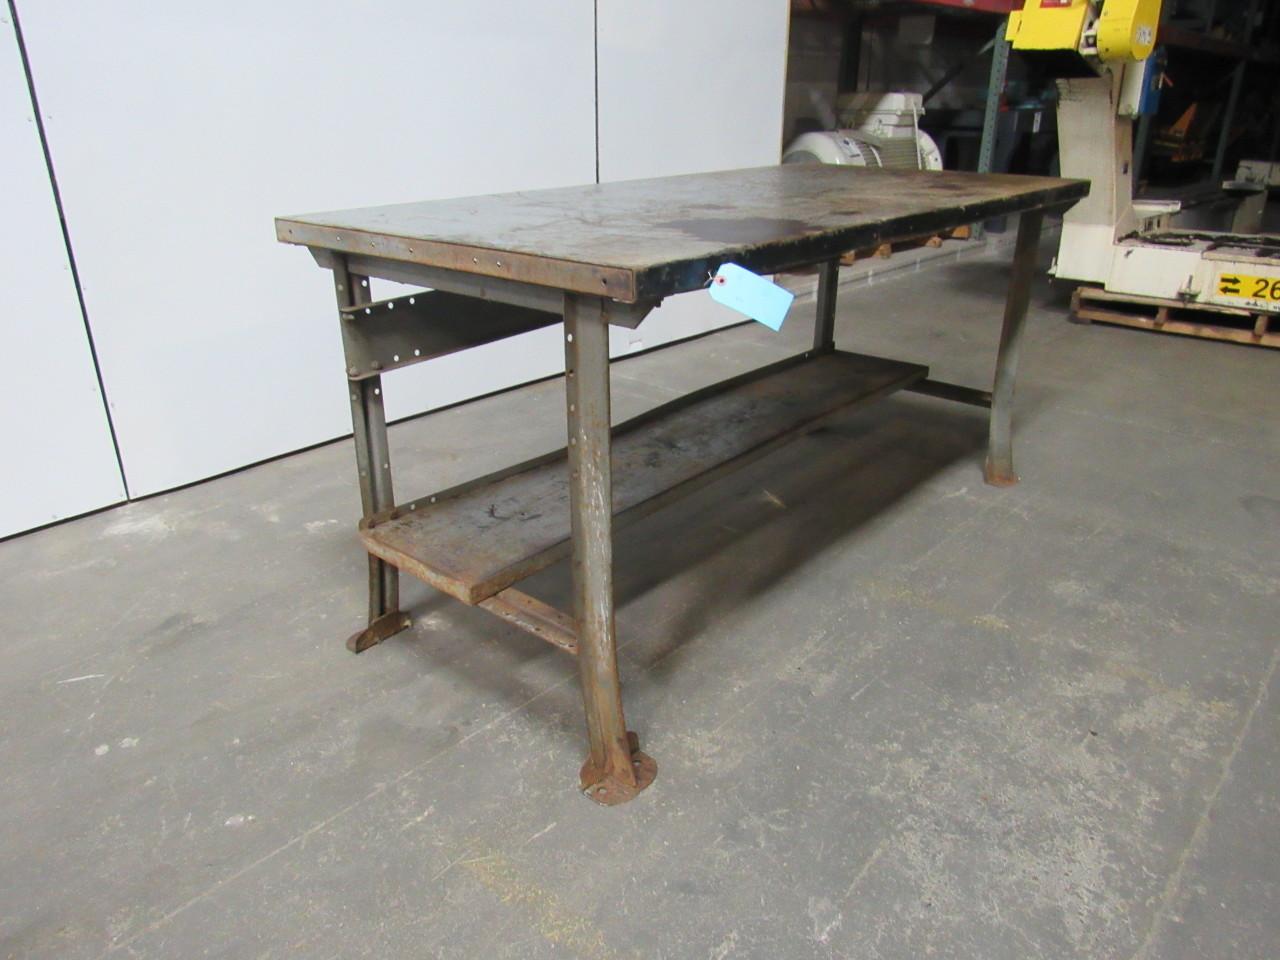 100 Work Bench Leg Vintage Industrial All Steel Welded Top